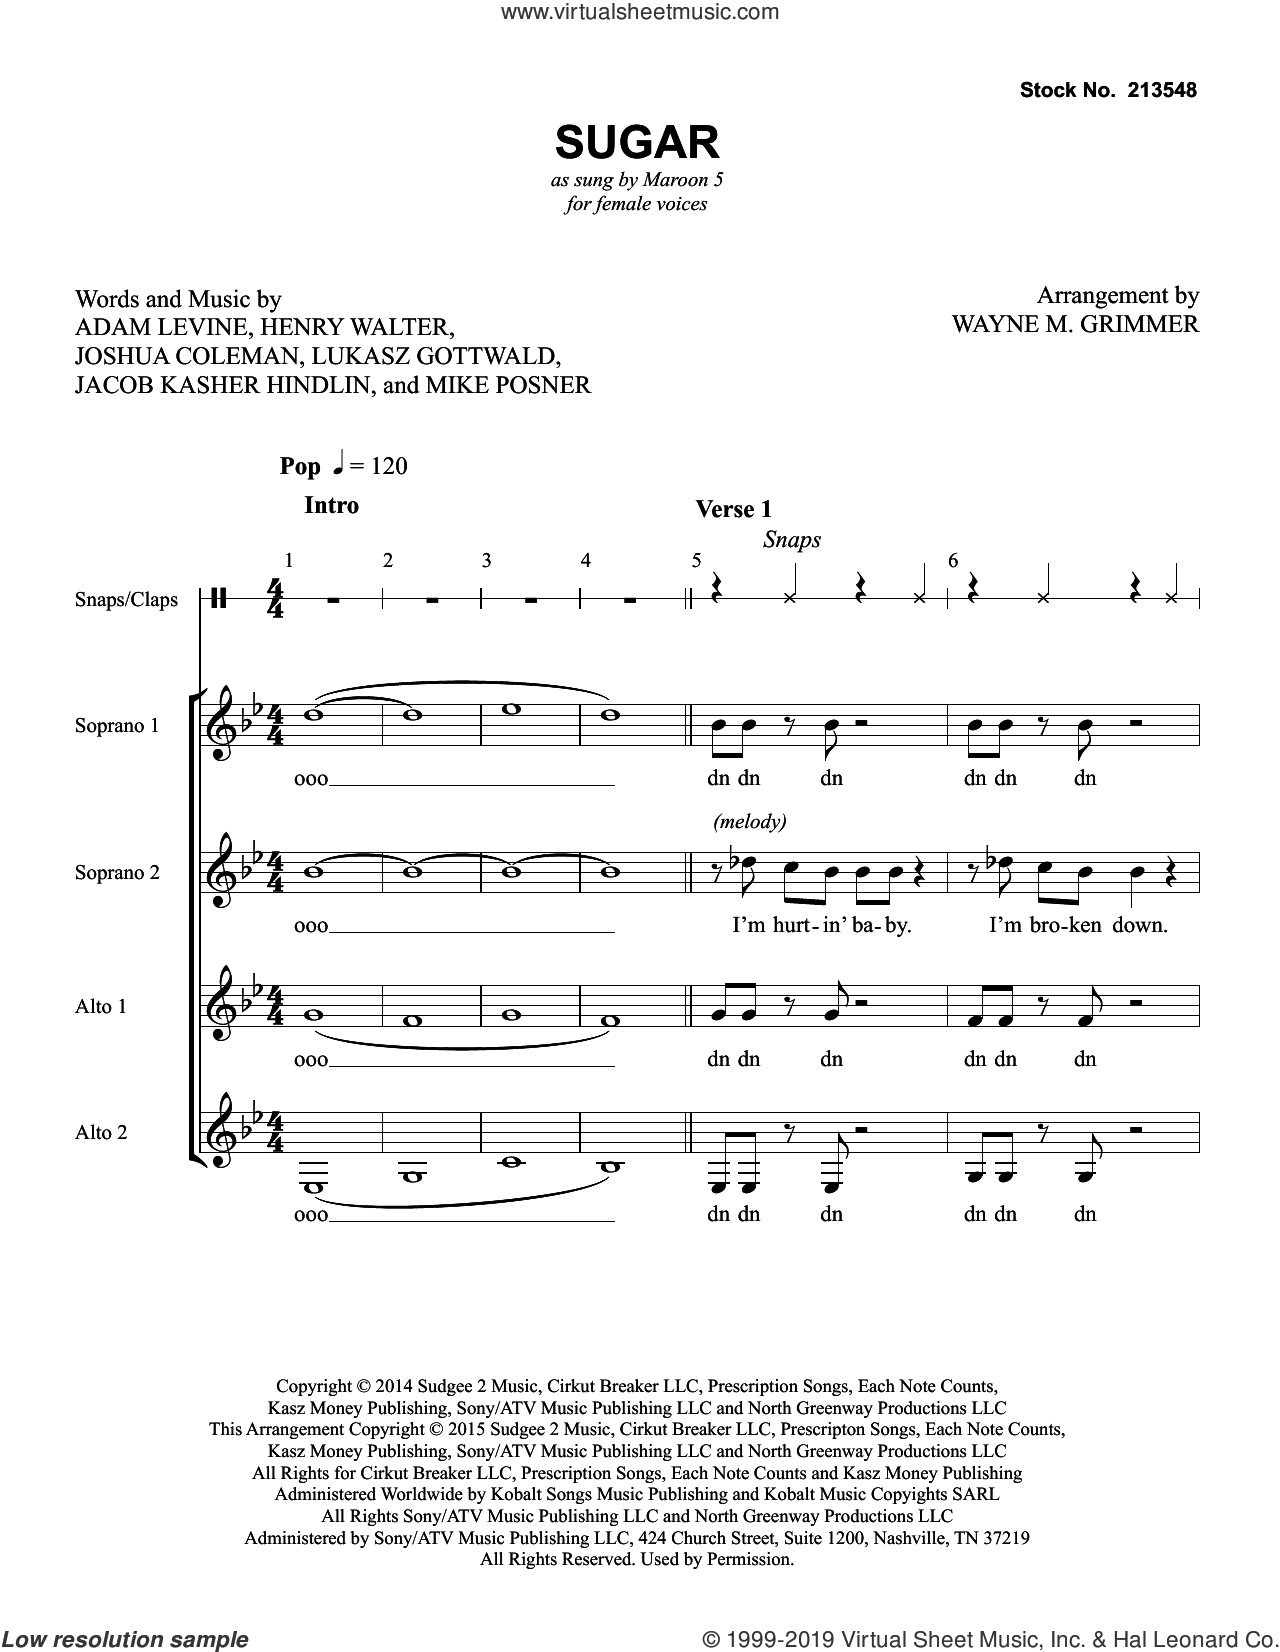 Sugar (arr. Wayne Grimmer) sheet music for choir (SSAA: soprano, alto) by Maroon 5, Wayne M. Grimmer, Adam Levine, Henry Walter, Jacob Kasher Hindlin, Joshua Coleman, Lukasz Gottwald and Mike Posner, intermediate skill level